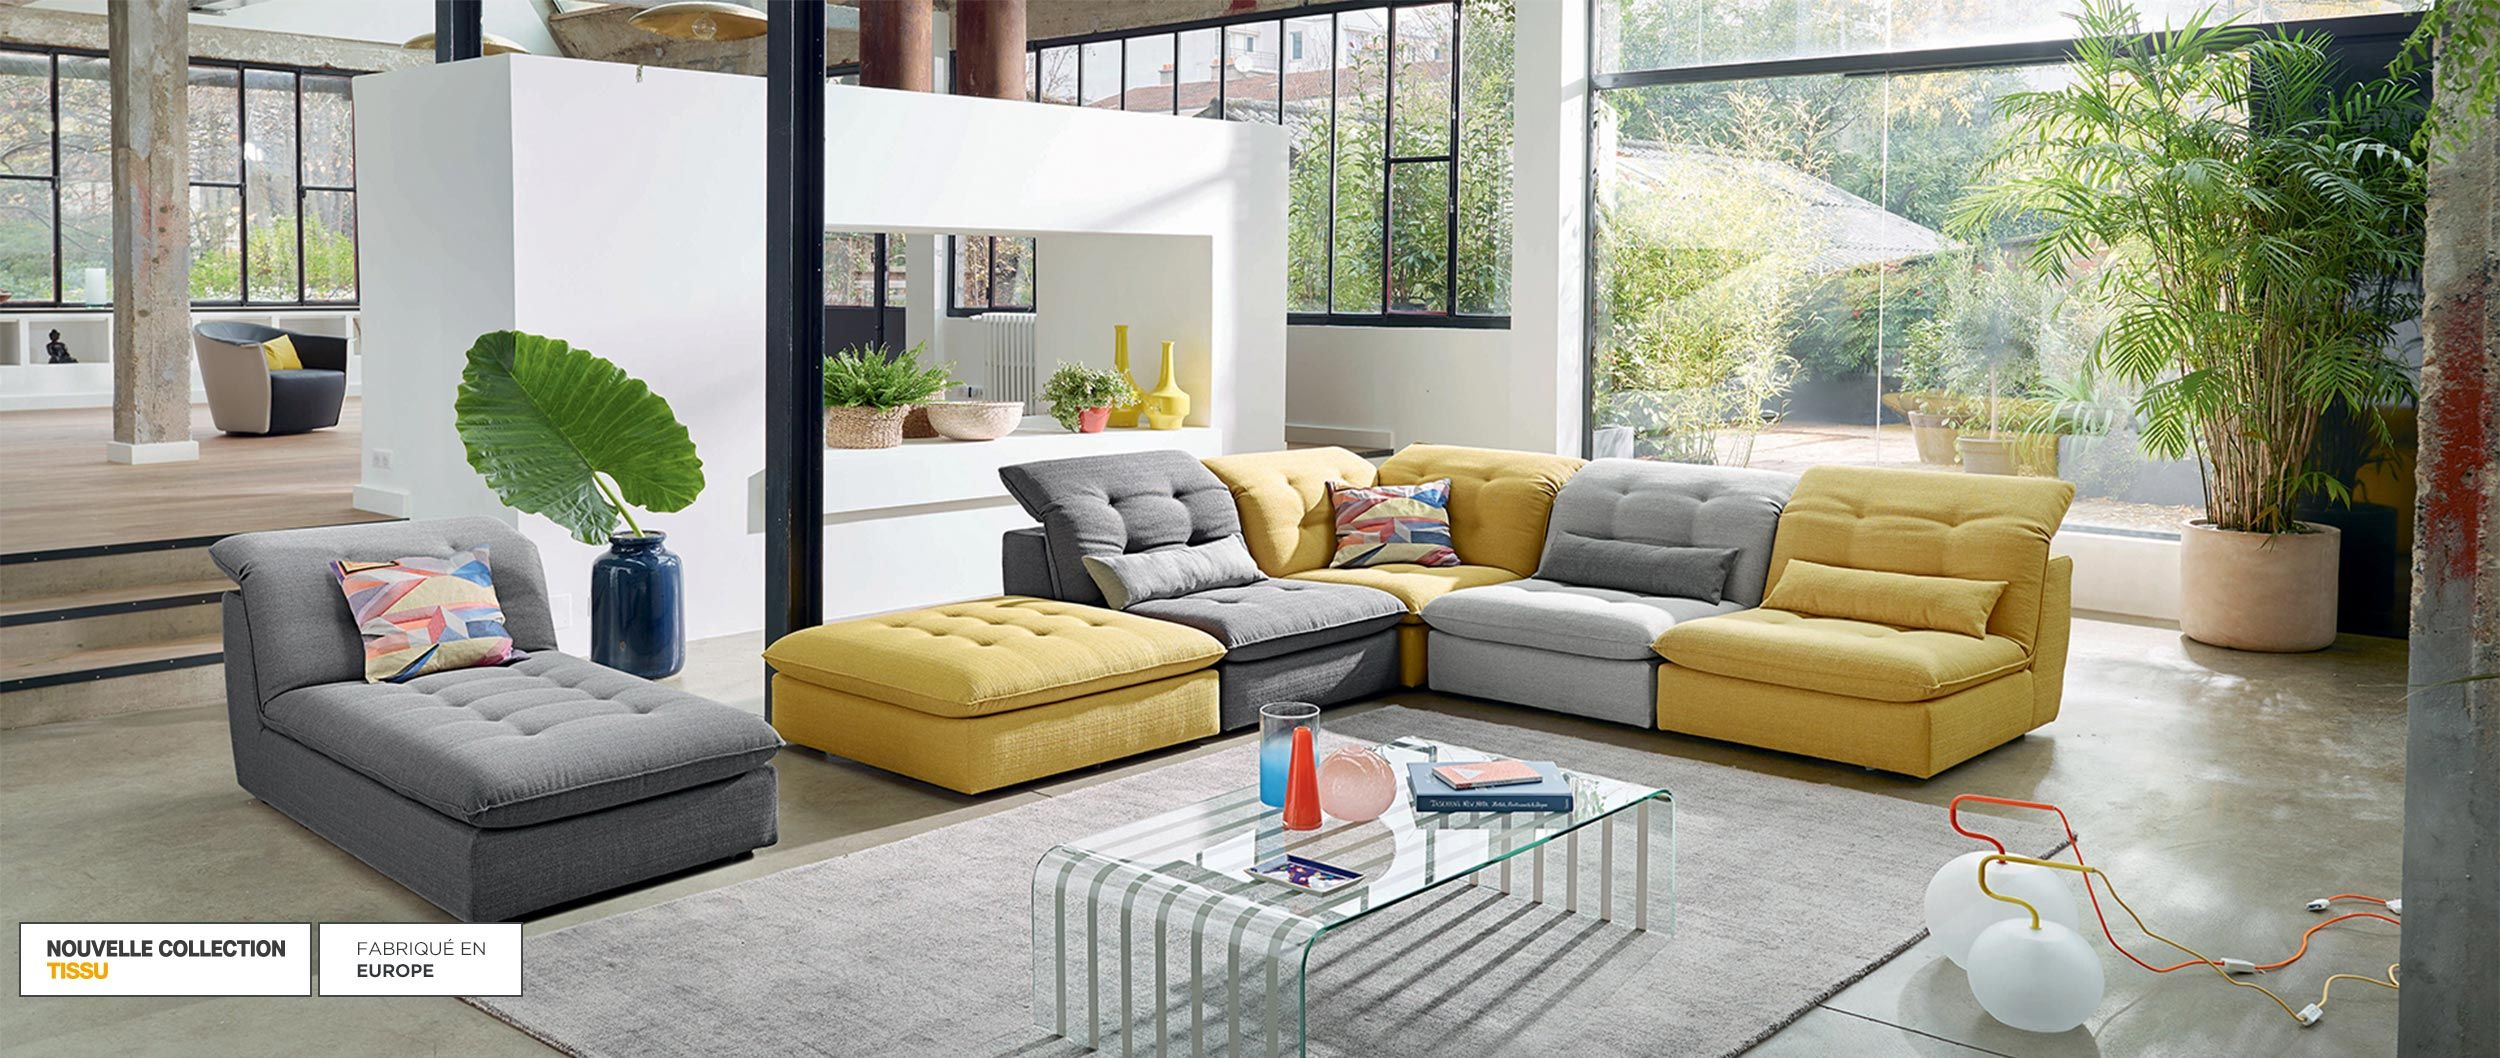 Canapes D Angle En Cuir Cuir De Buffle Cuir Et Tissu Cuir Center Cuir Center Cuir Center Canape Composable Canape Angle